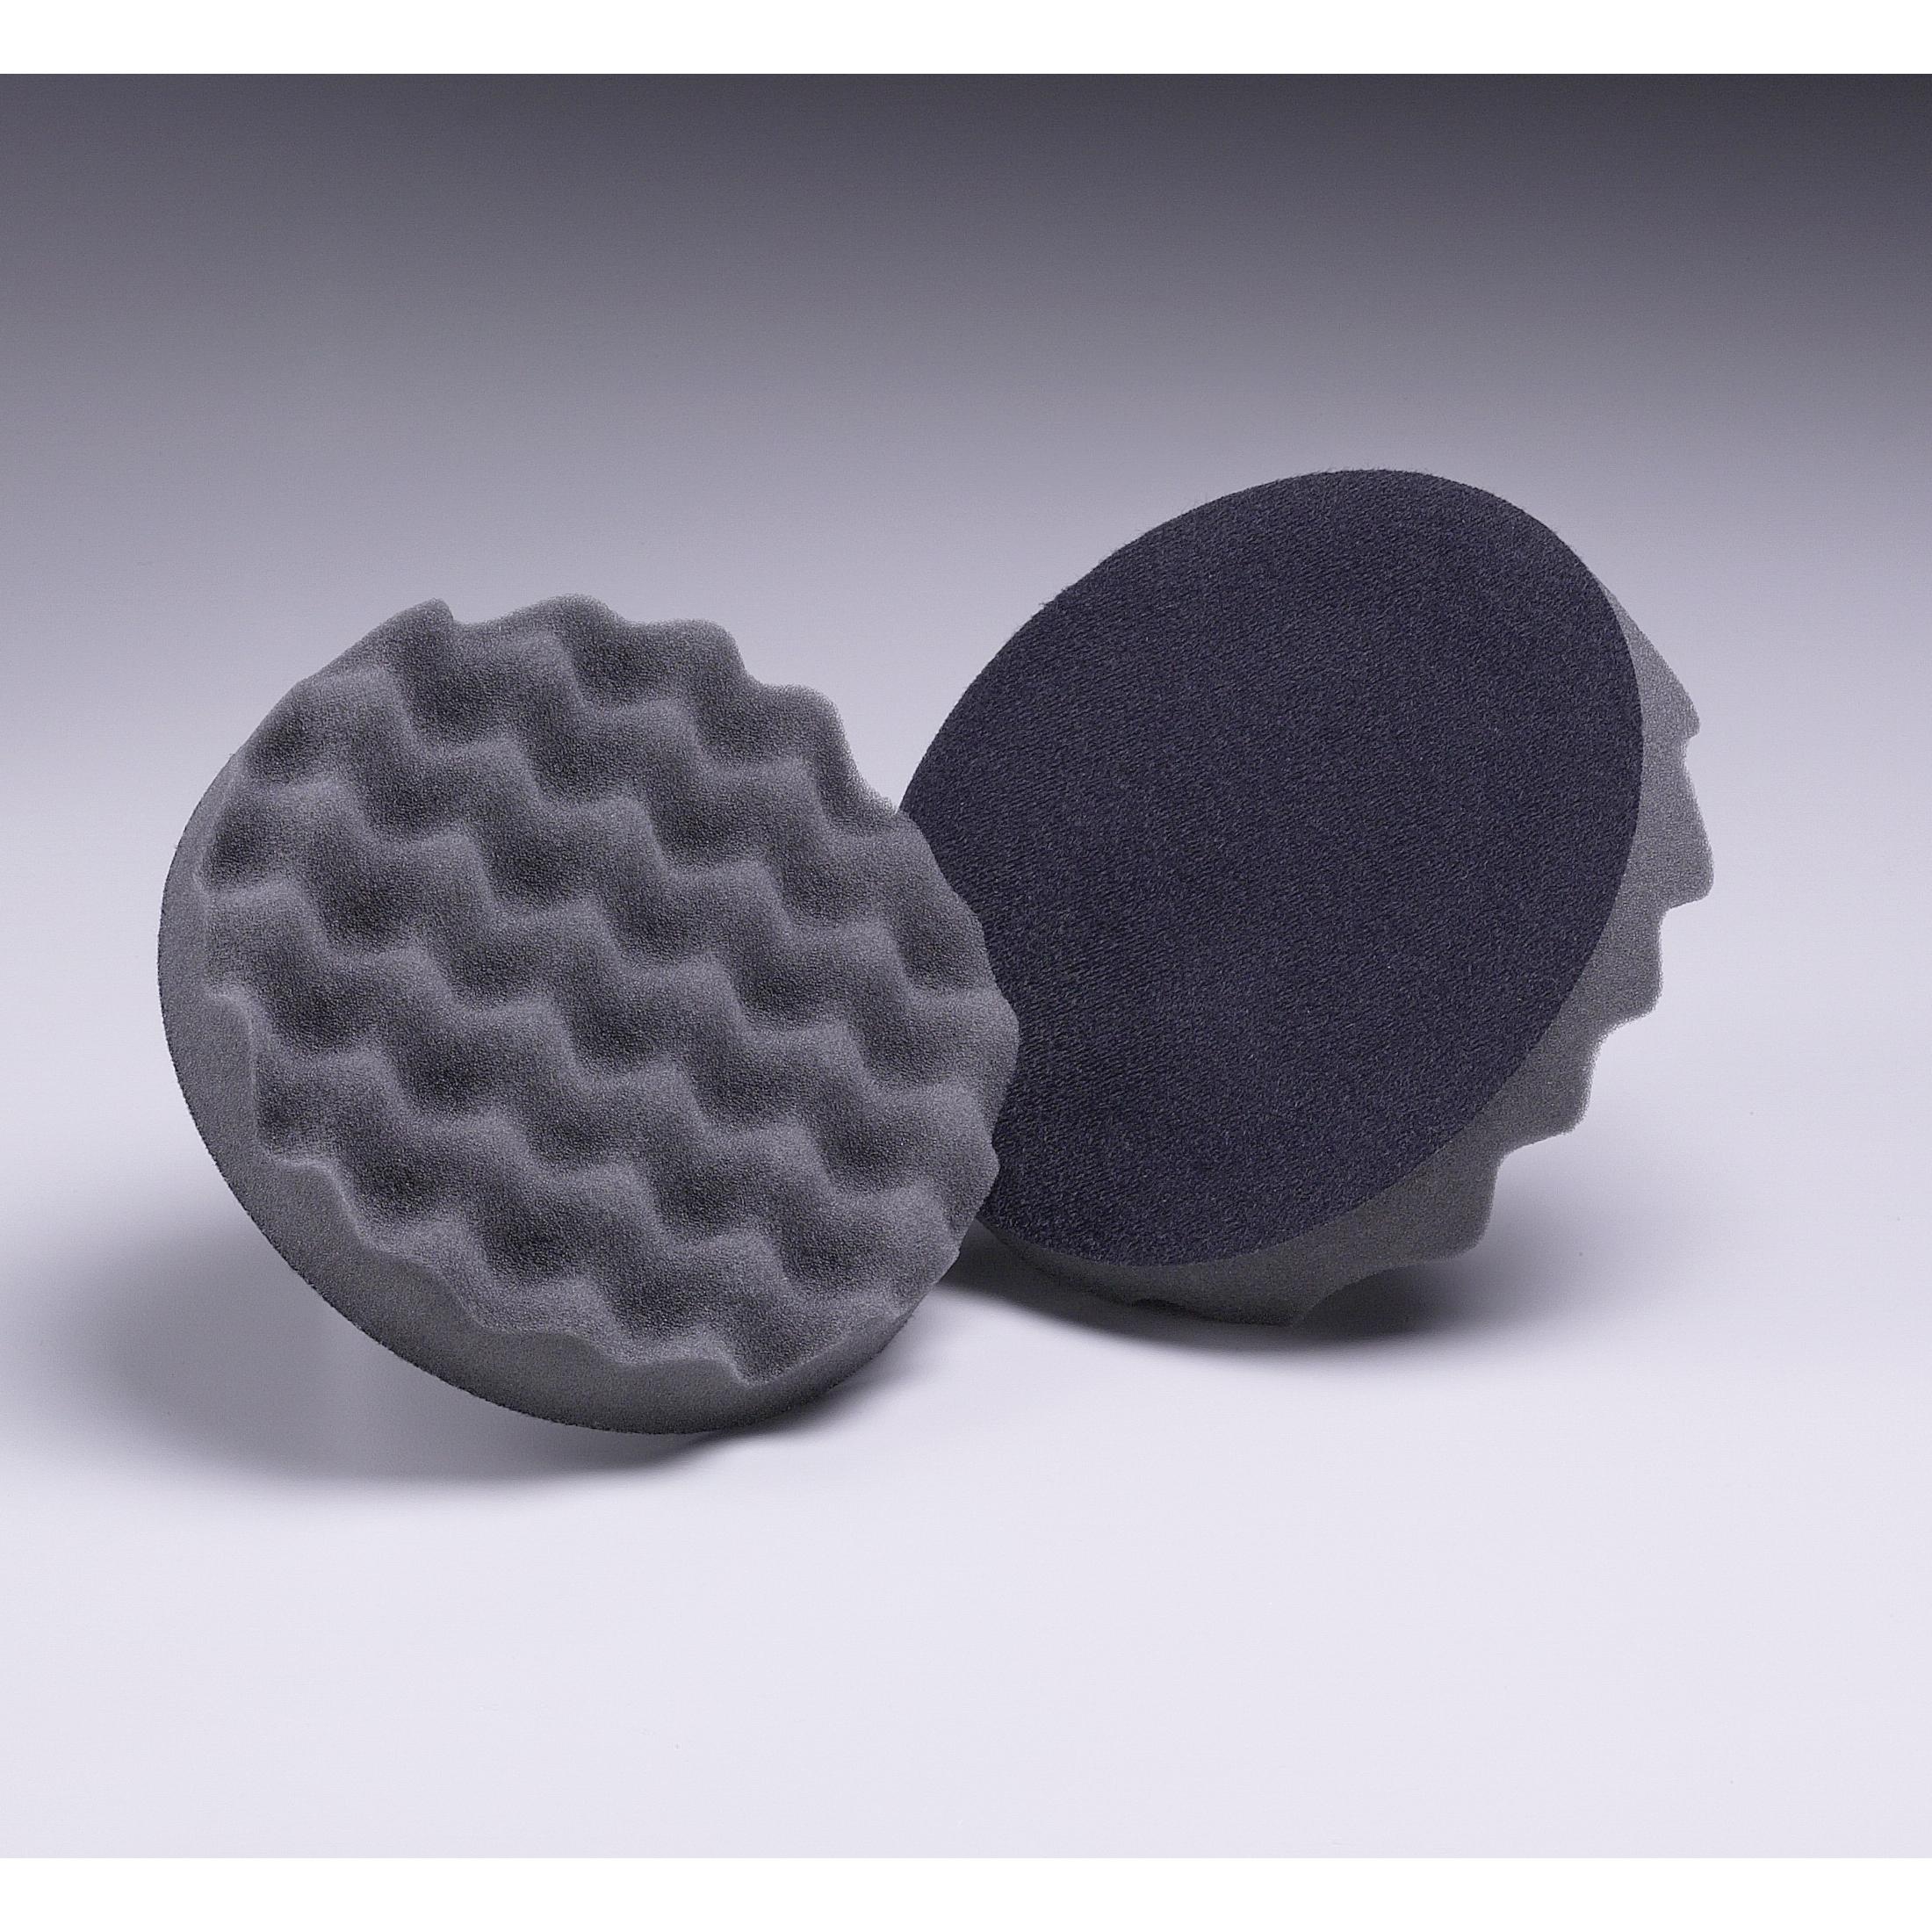 3M™ PerfectIt™ 3M™ Hookit™ 051131-05727 Regular Soft Density Polishing Pad, 76.2 mm OAD, Hook and Loop Attachment, Polyurethane Foam Pad